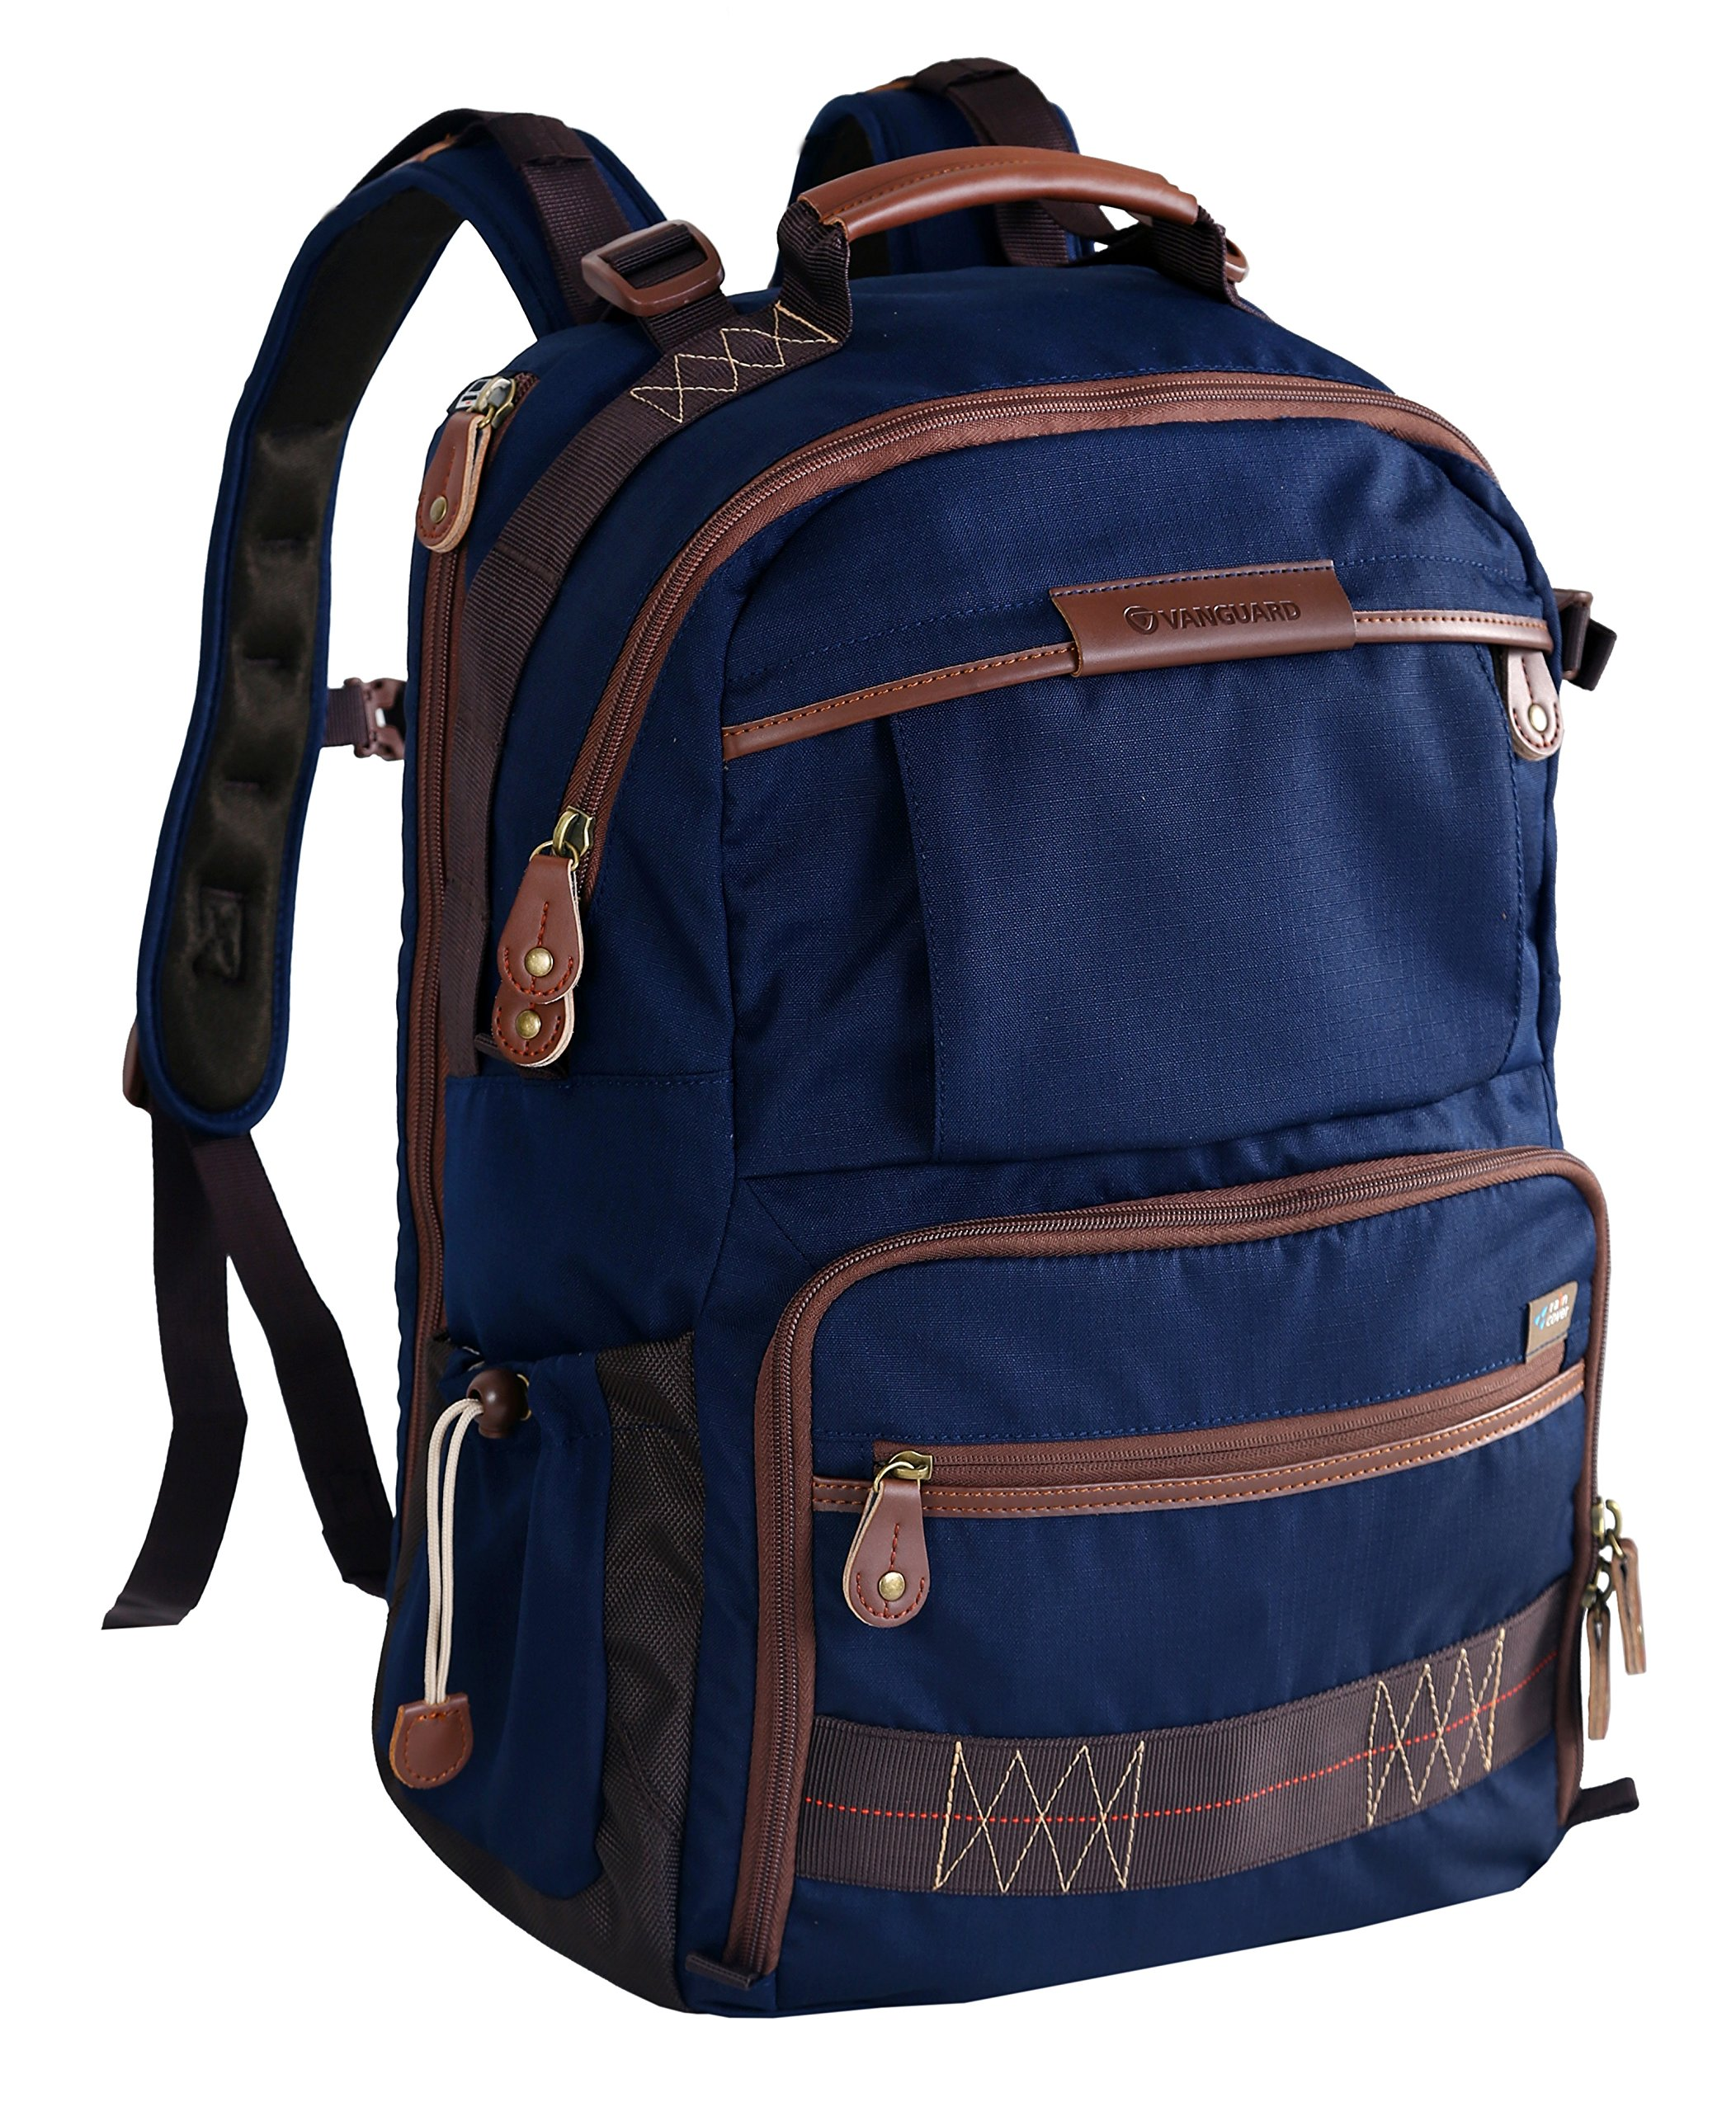 VANGUARD HAVANA 48BL Backpack, Blue